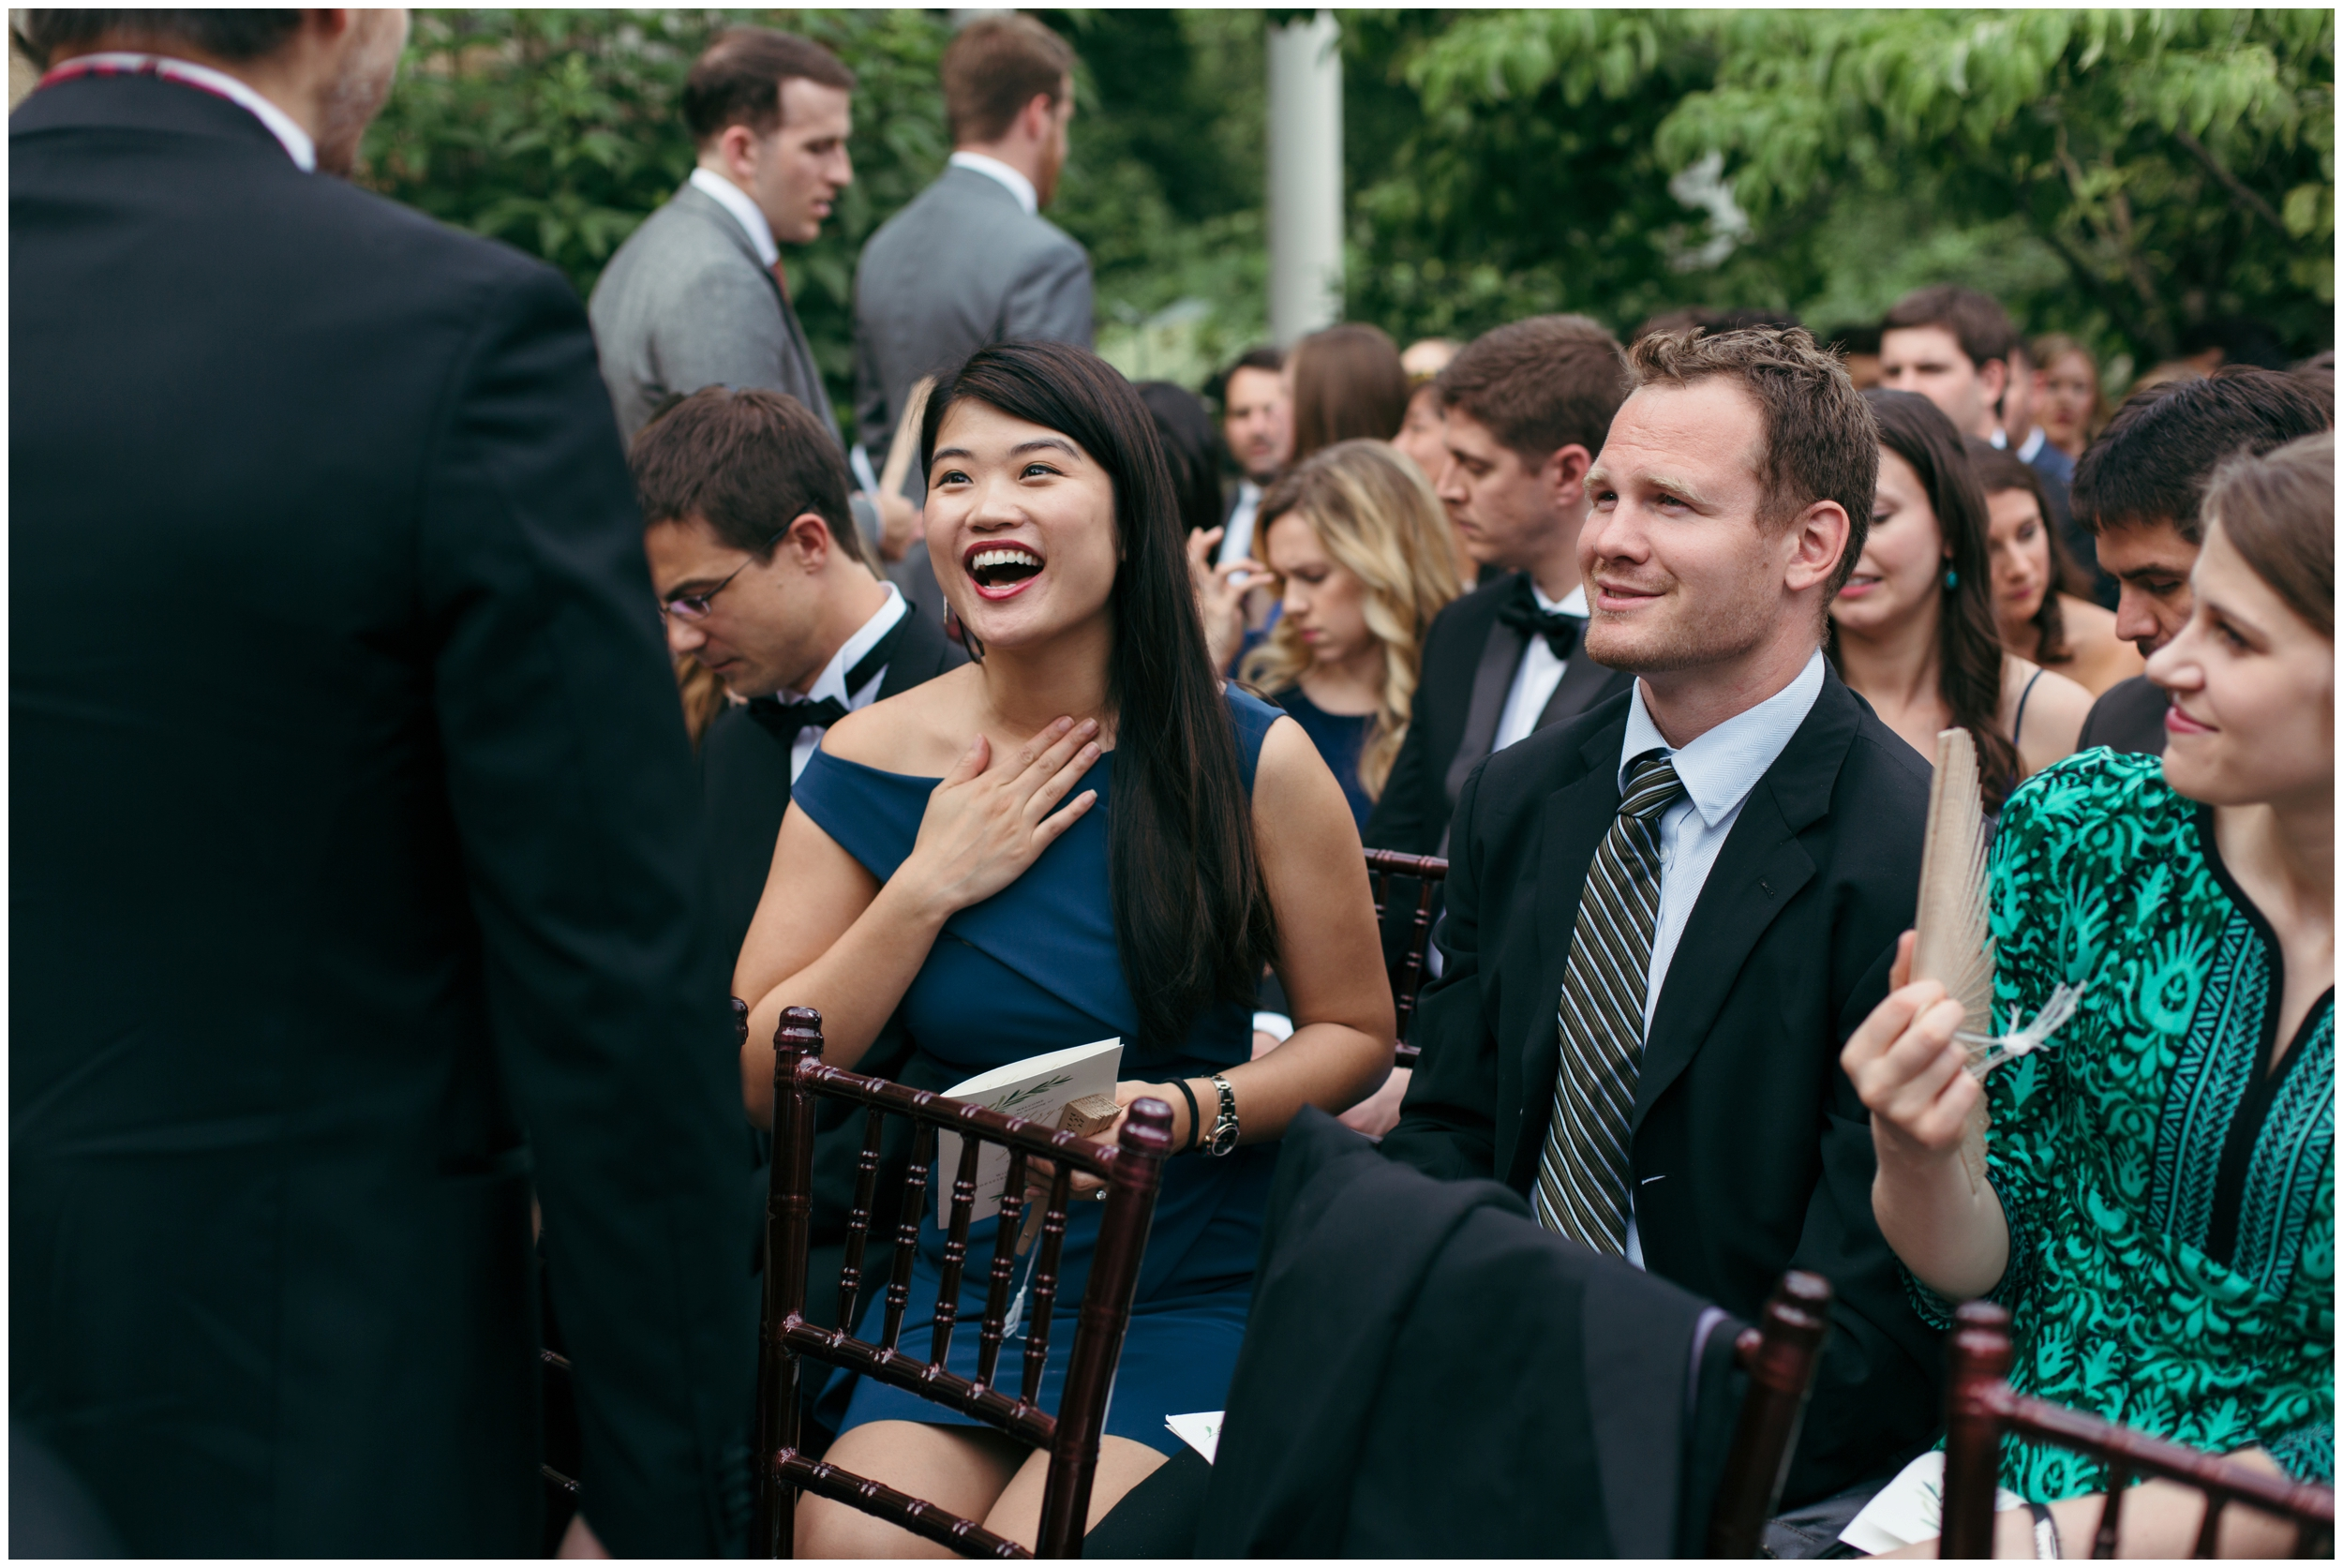 Willowdale-Estate-Wedding-Bailey-Q-Photo-Boston-Wedding-Photographer-025.JPG